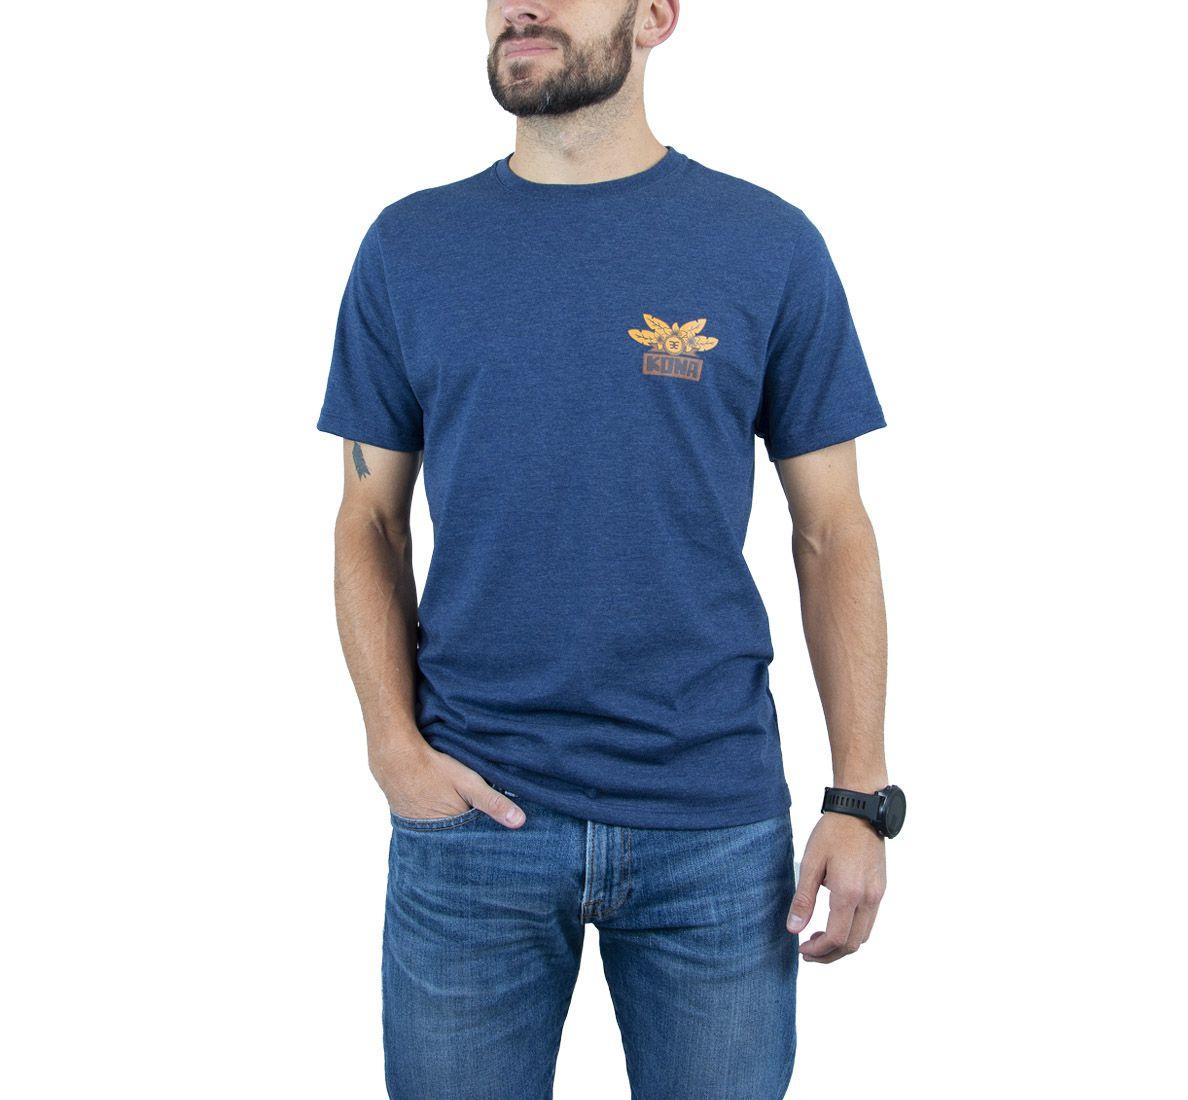 Camiseta Kona Masc - Azul Marinho - Woom 247